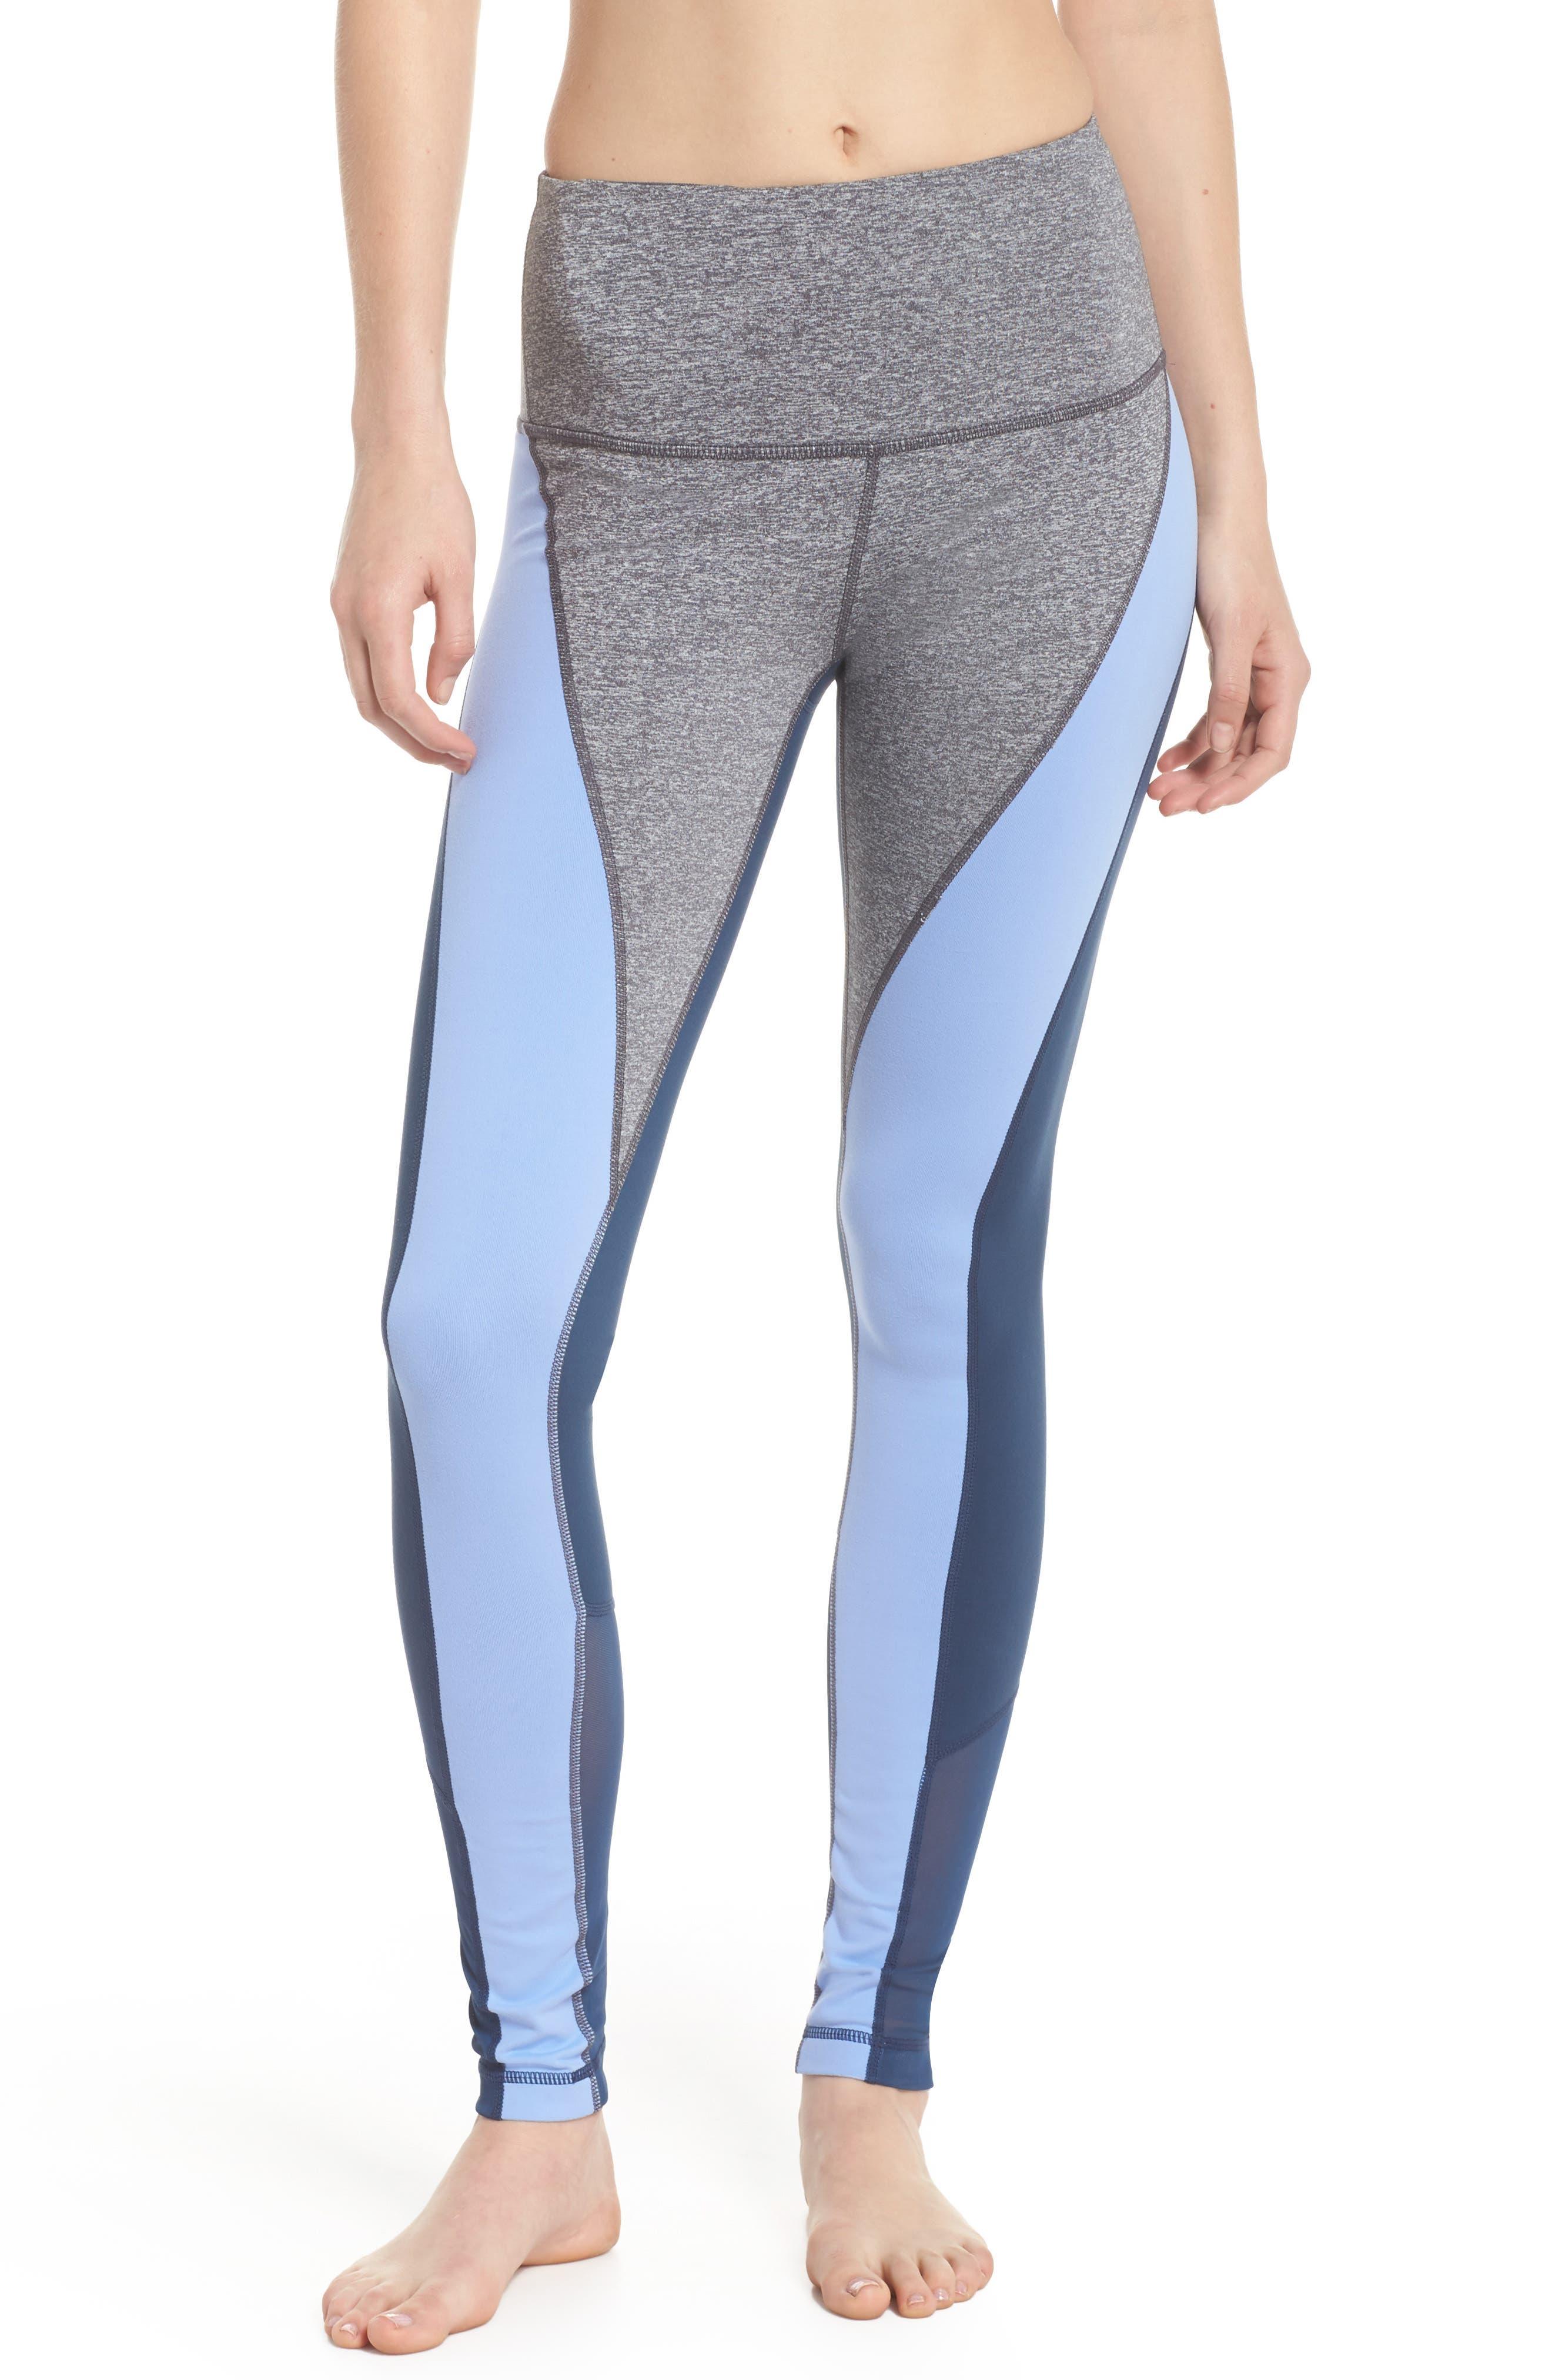 Get in Line High Waist Leggings,                             Main thumbnail 1, color,                             Grey Graphite Melange